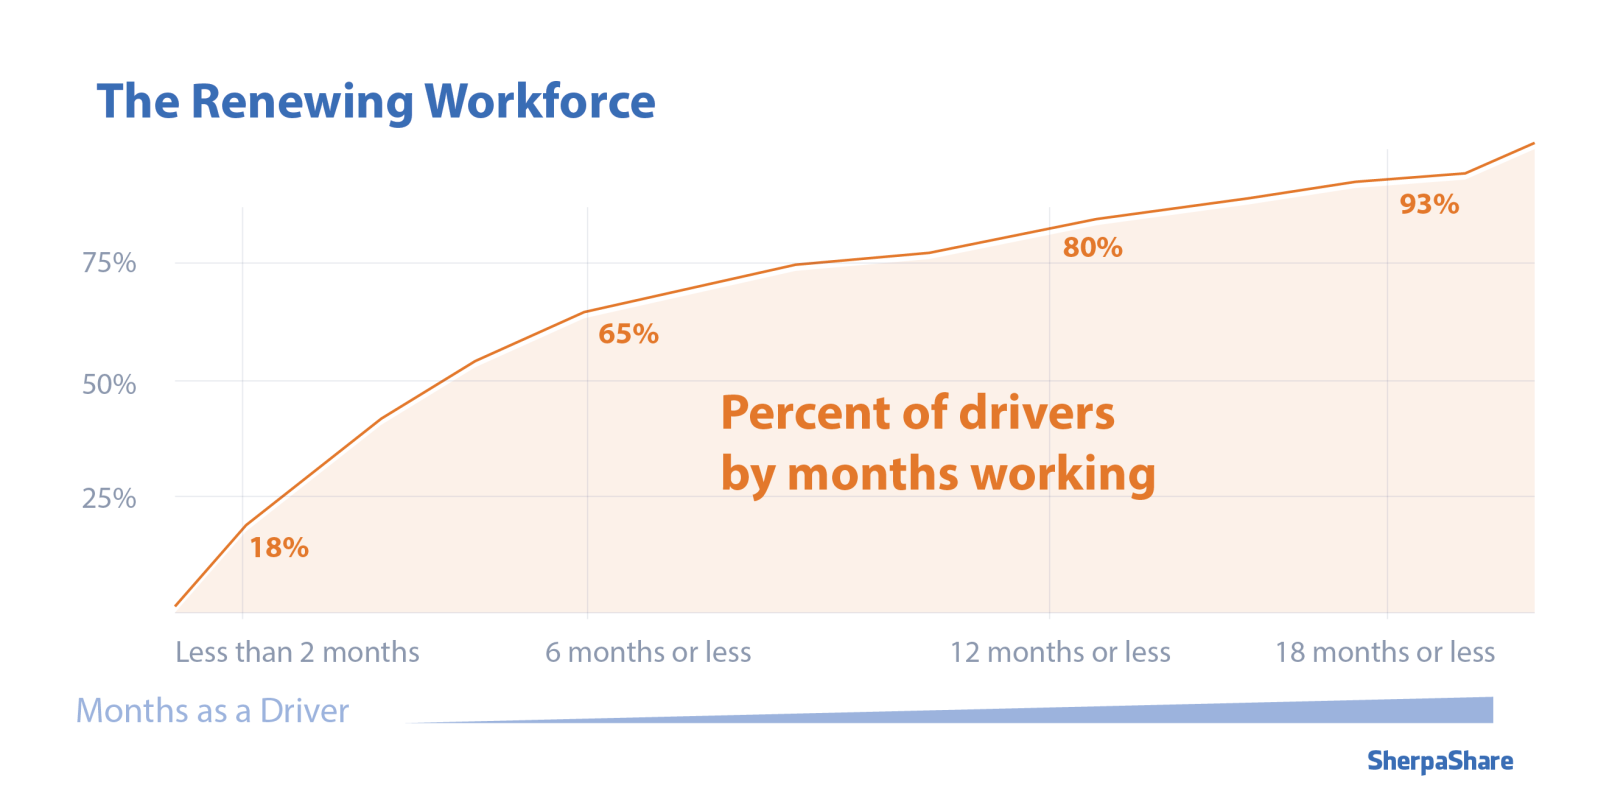 Uber and Lyft renewing workforce